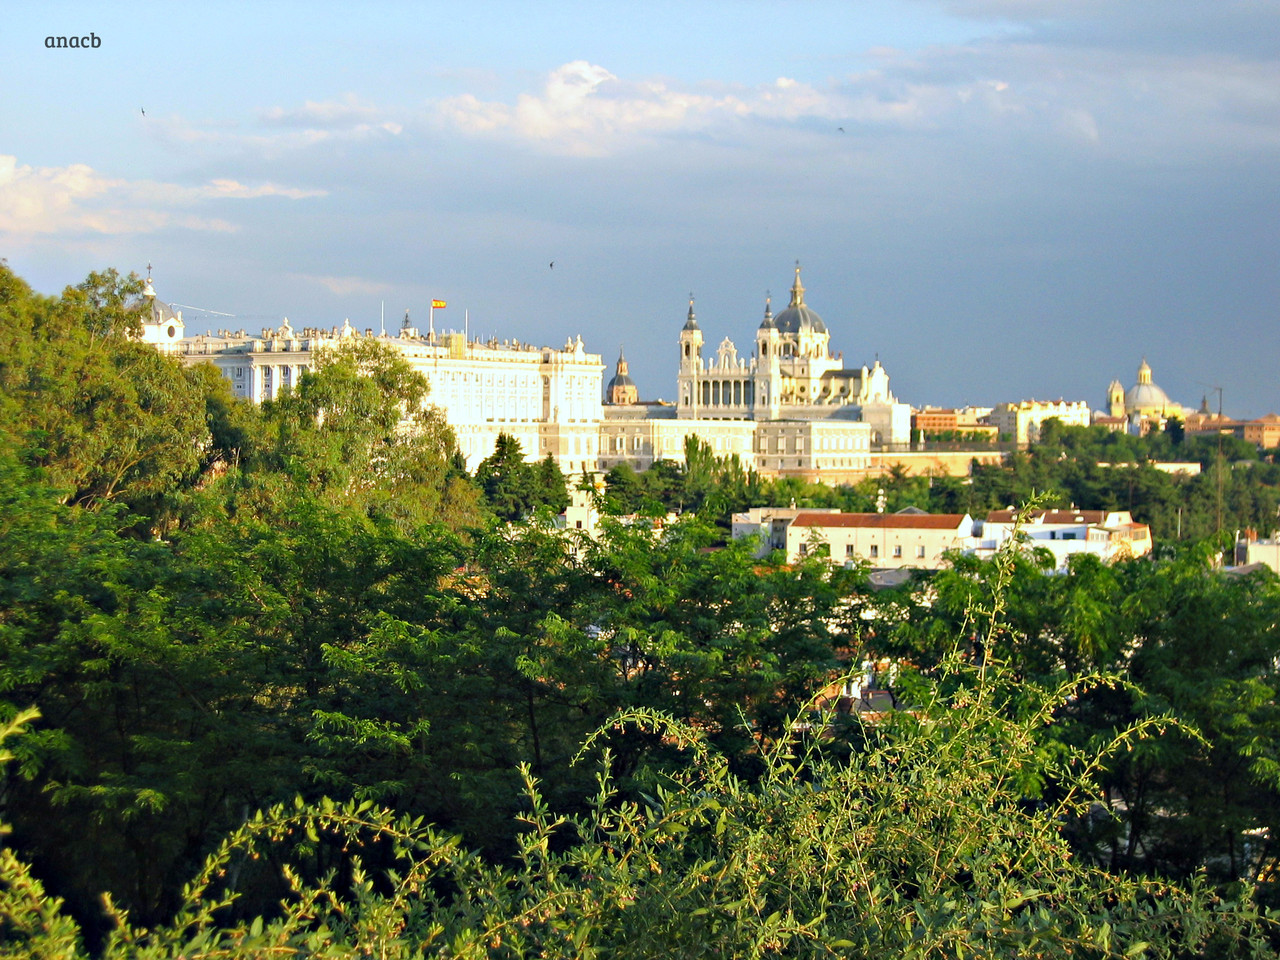 ao acaso #41 Palácio Real e Almudena, Madrid.jpg